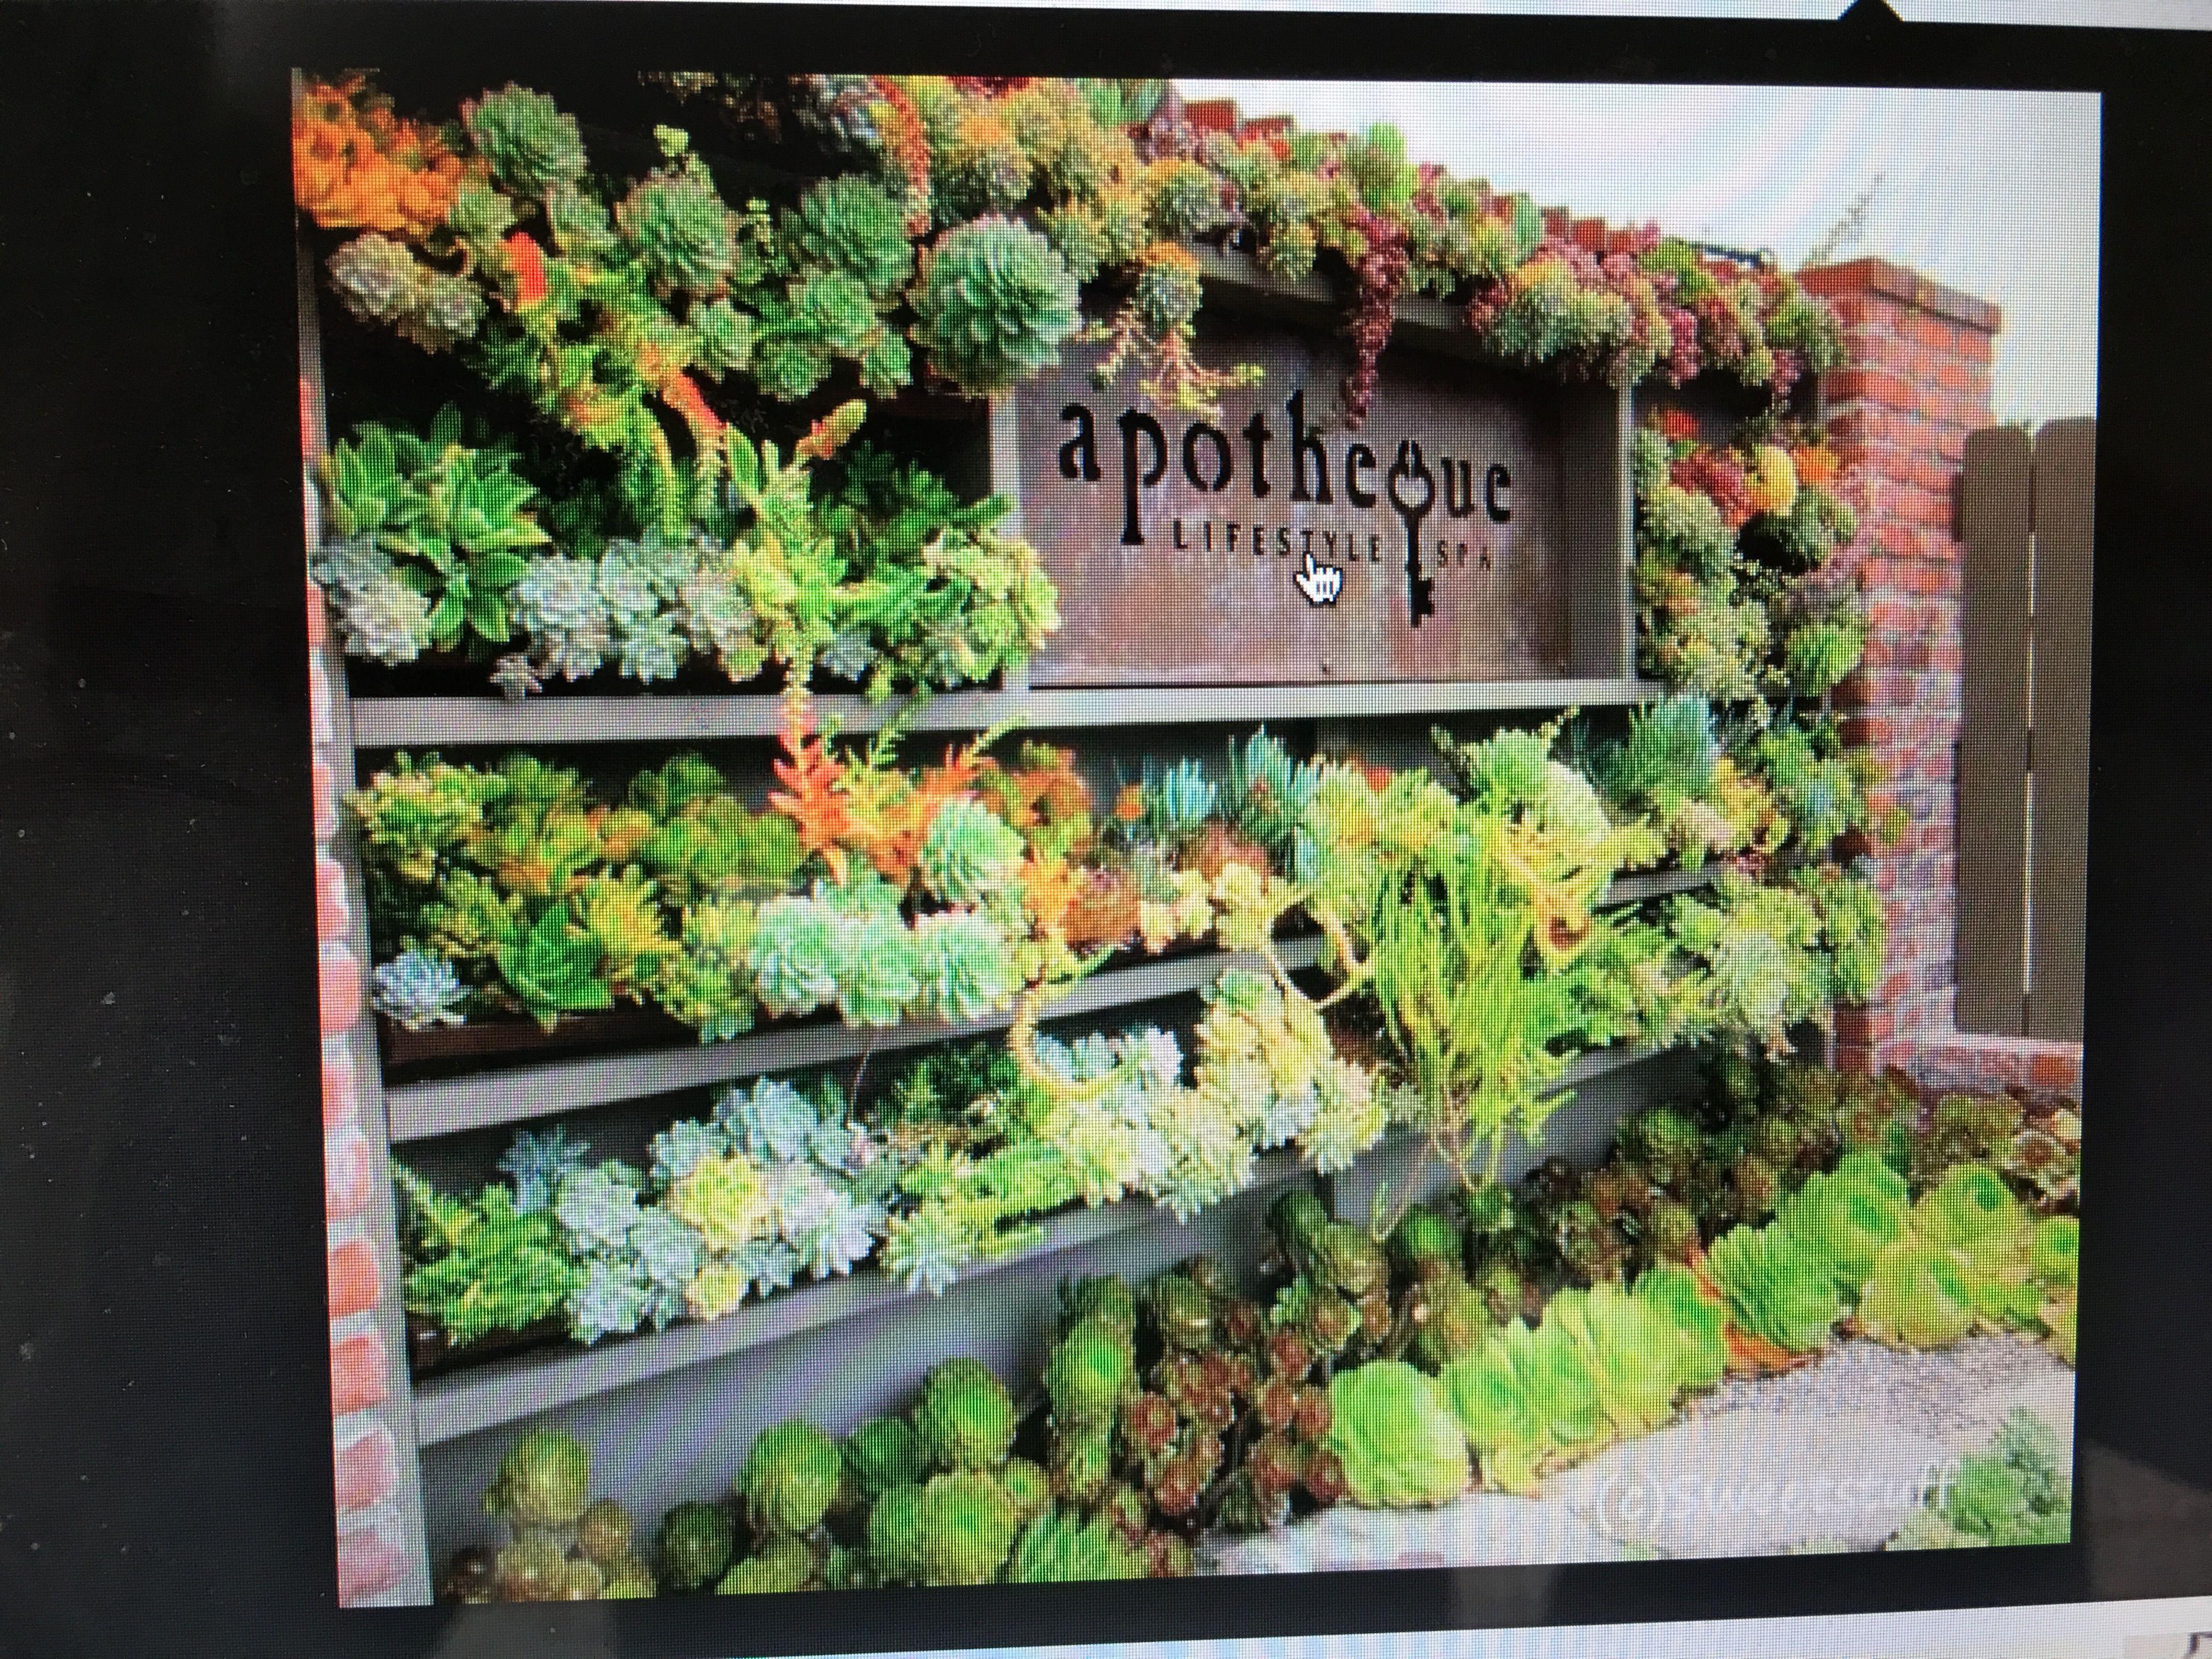 Mur Vegetal Plante Grasse Épinglé par brita wald sur organic wall garden | jardins